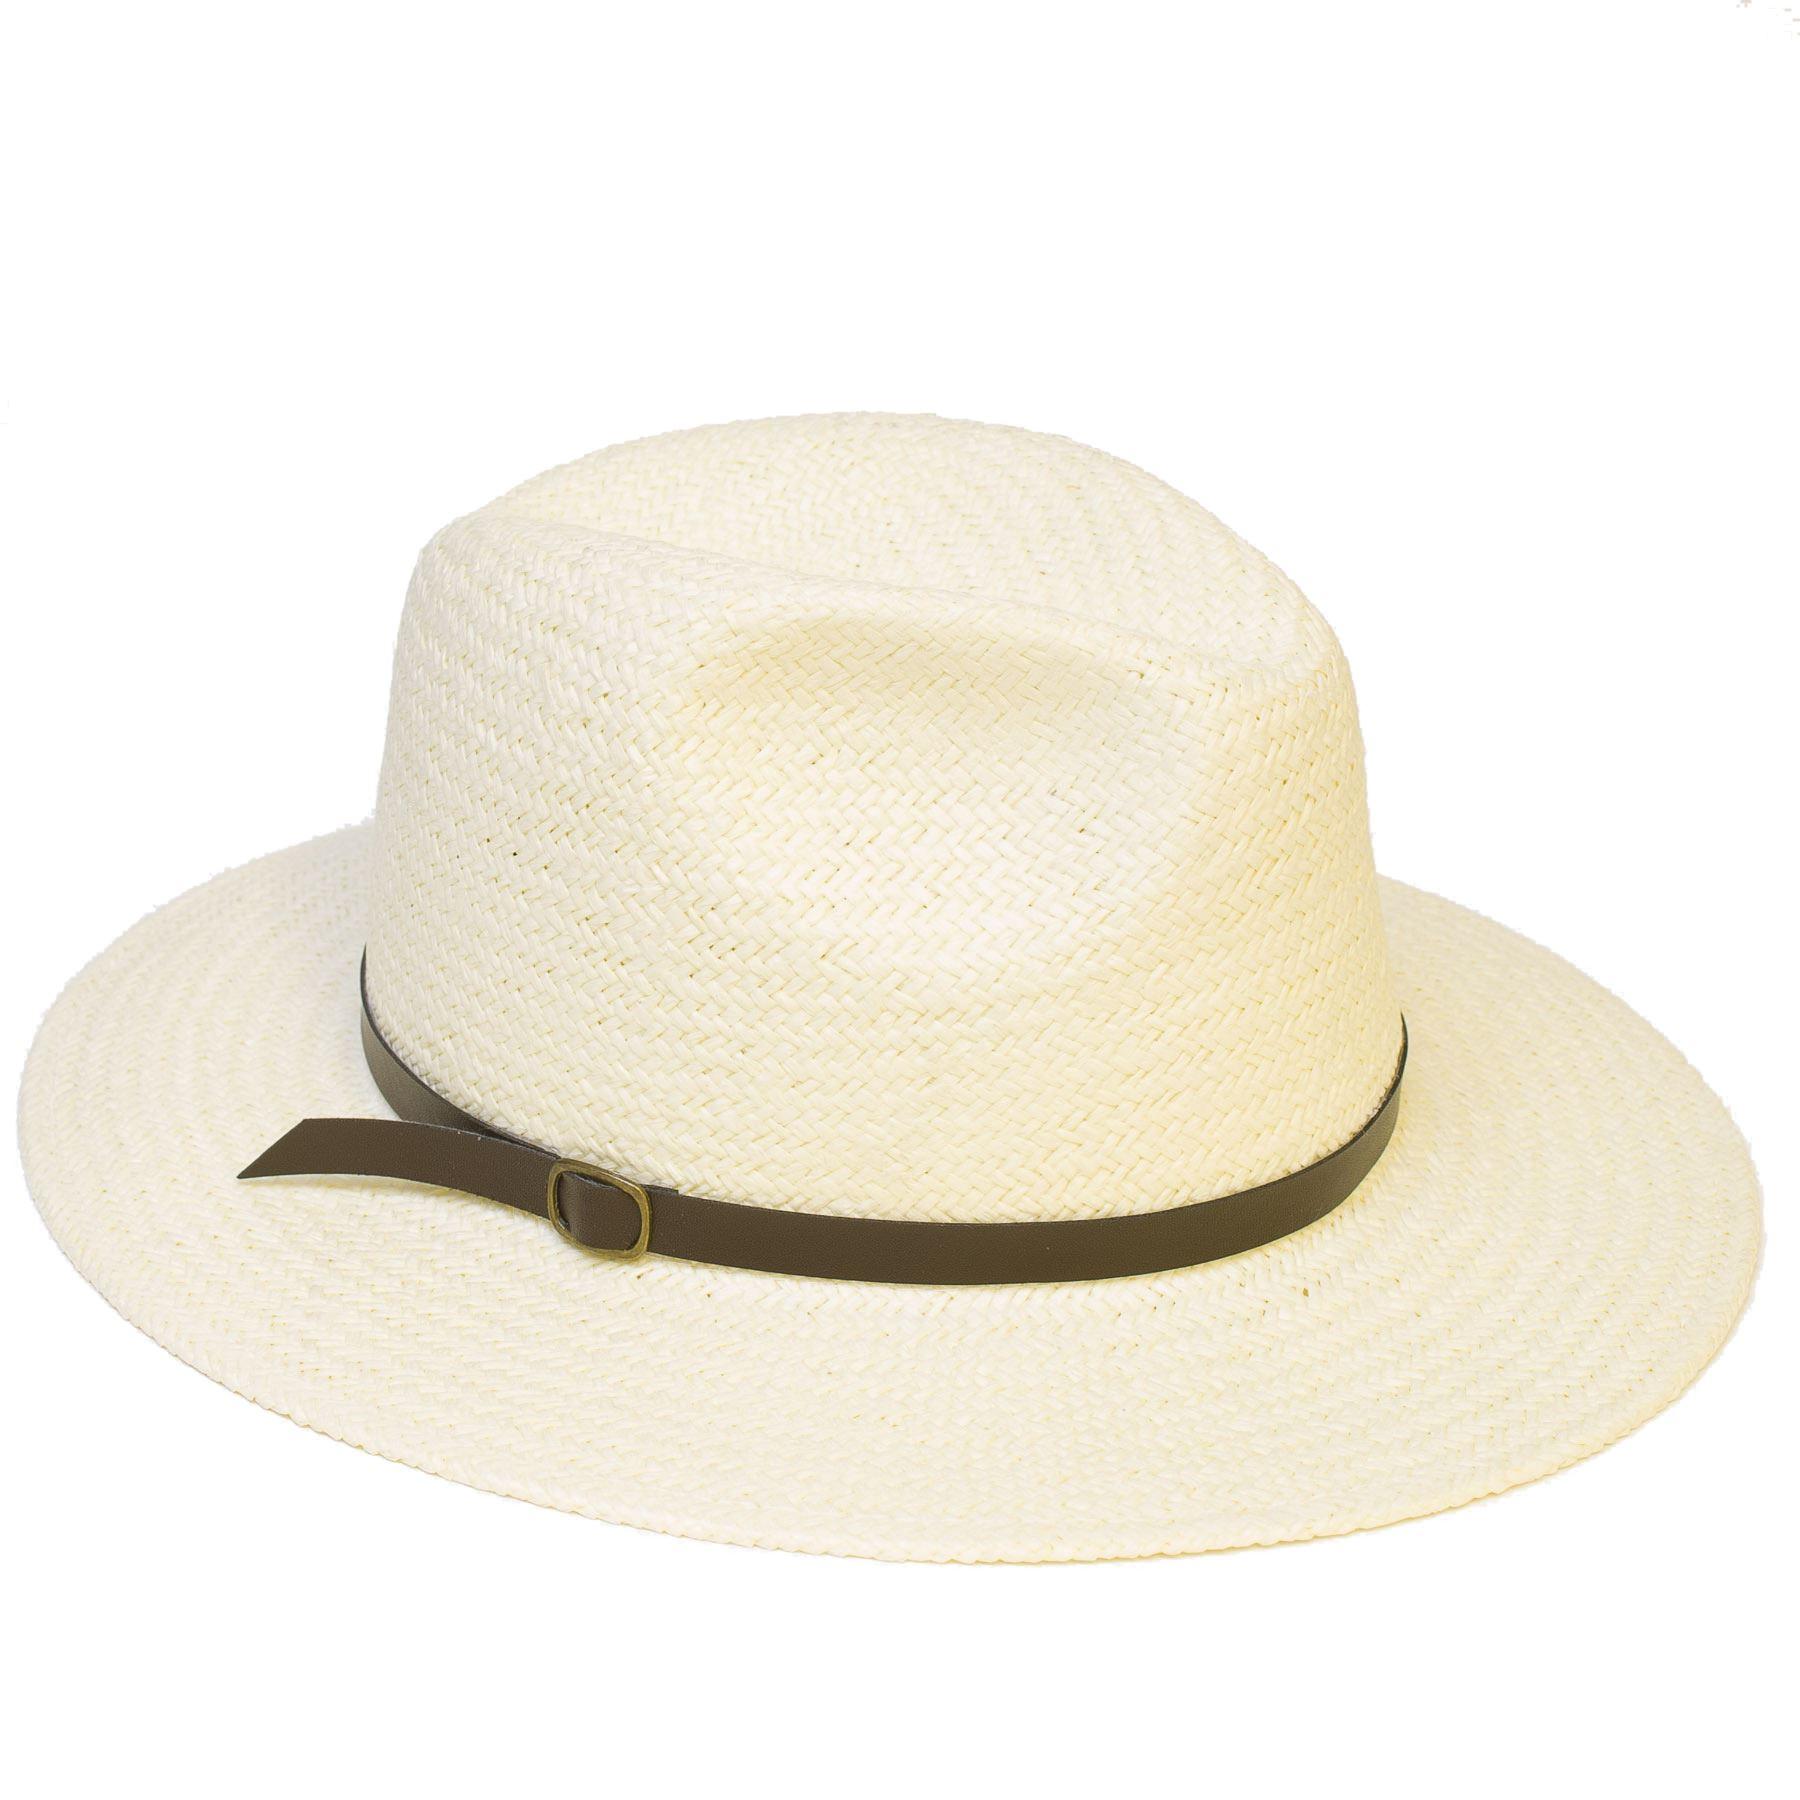 Panama Style Cream Fedora Hat | eBay